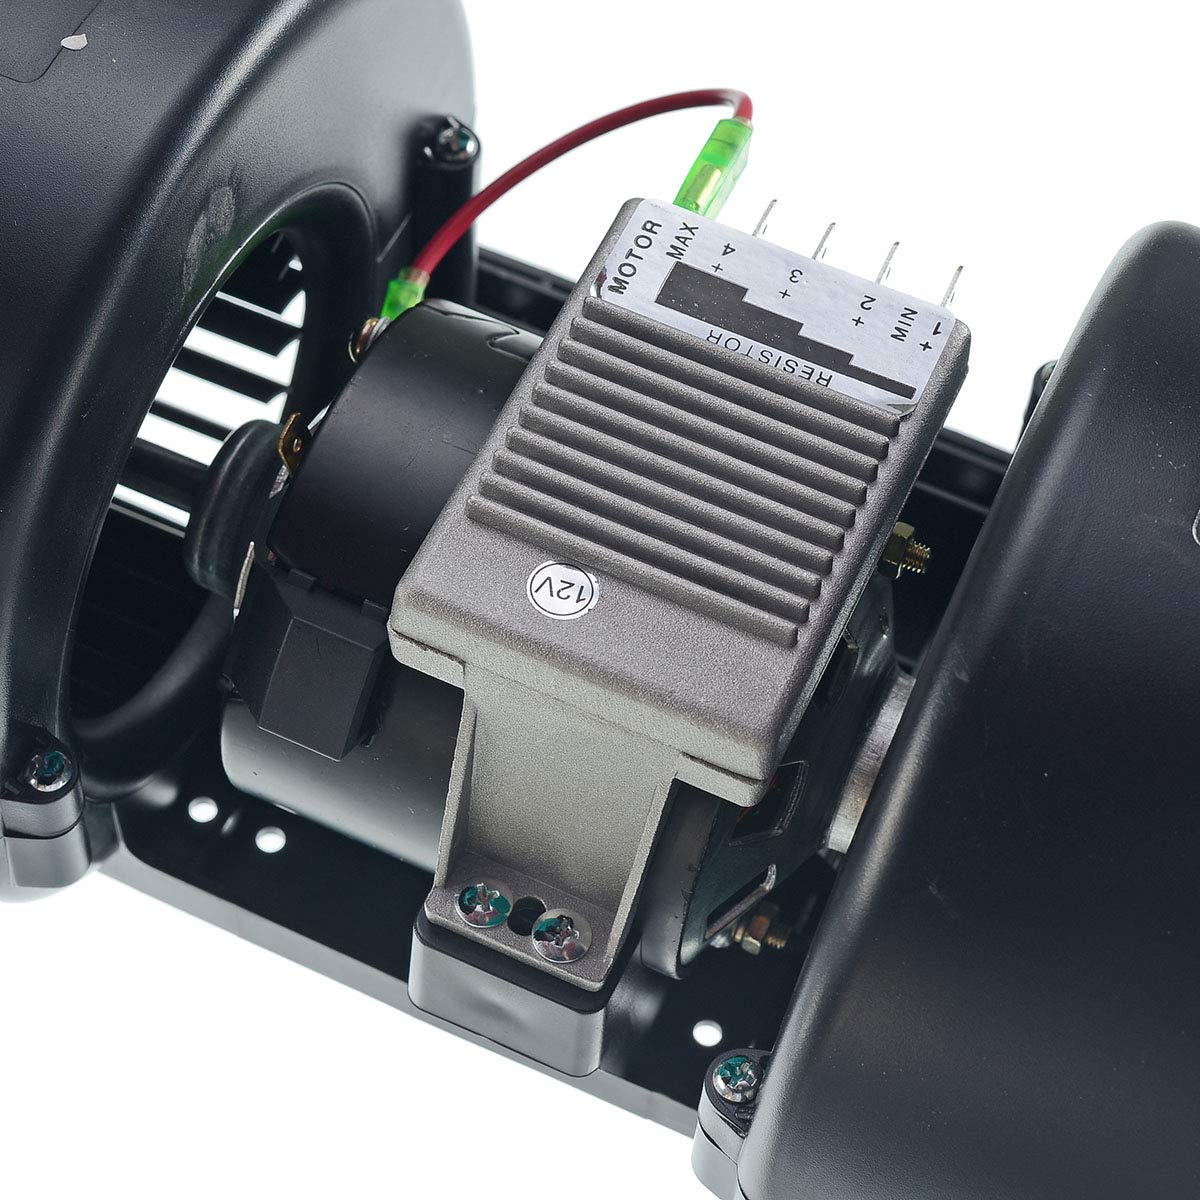 Radial Gebl/äse Heizungsl/üfter vorne bei Axial L/üfter 12V 1080m/³//h 25,3 amp 006-A40-22